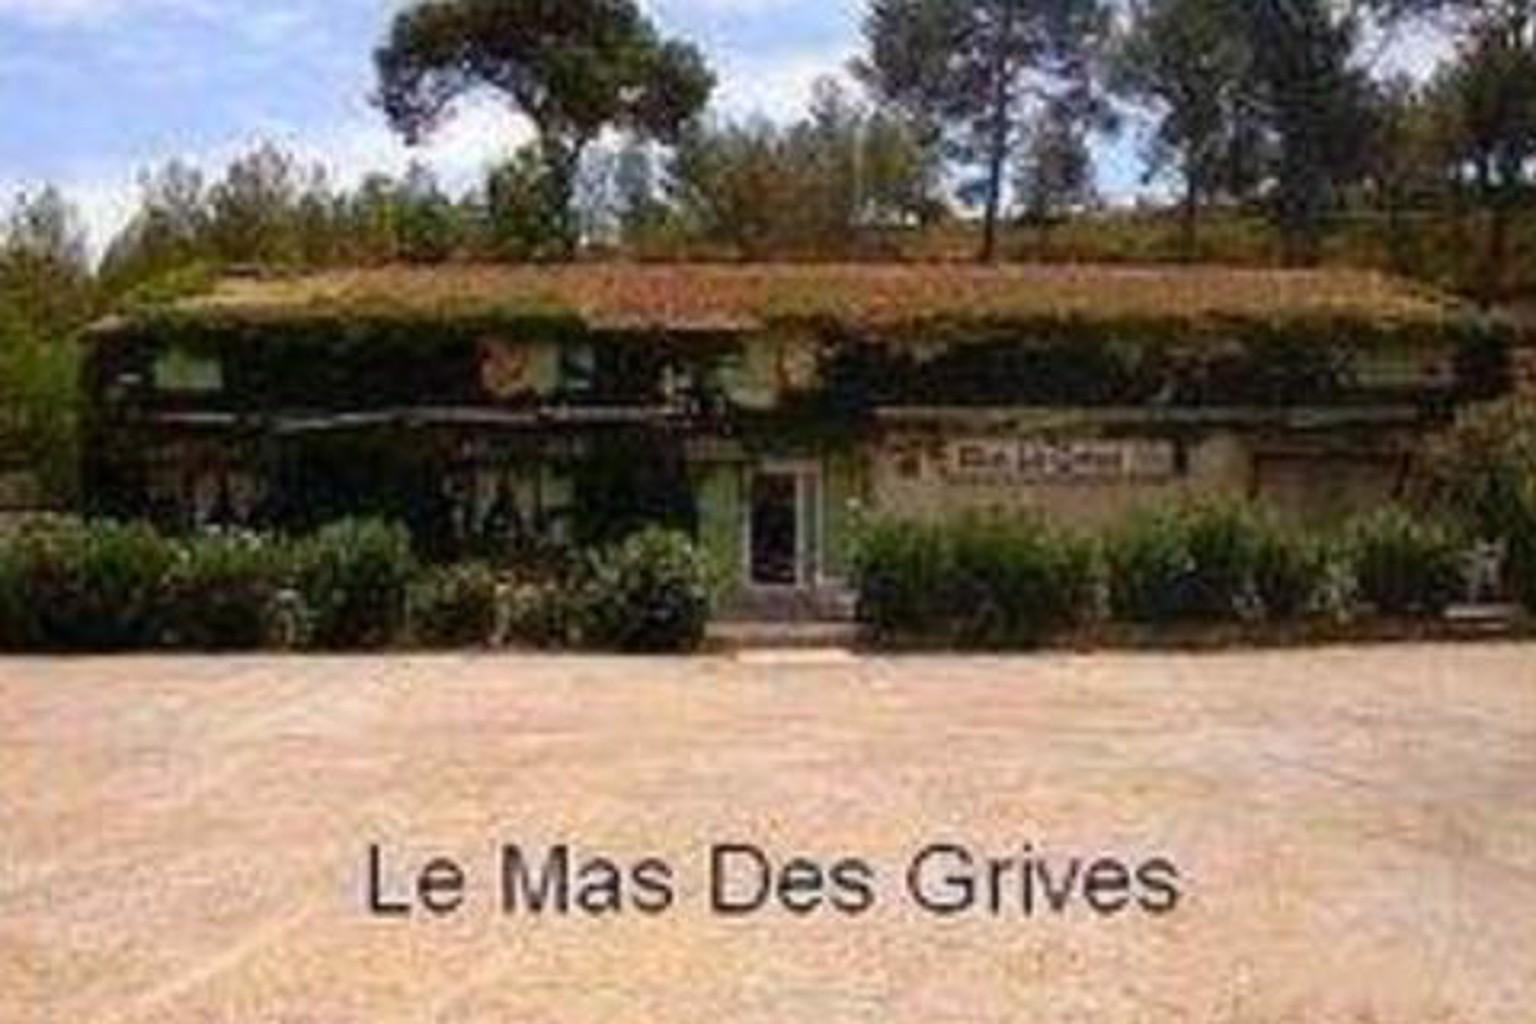 Hotel Mas Des Grives